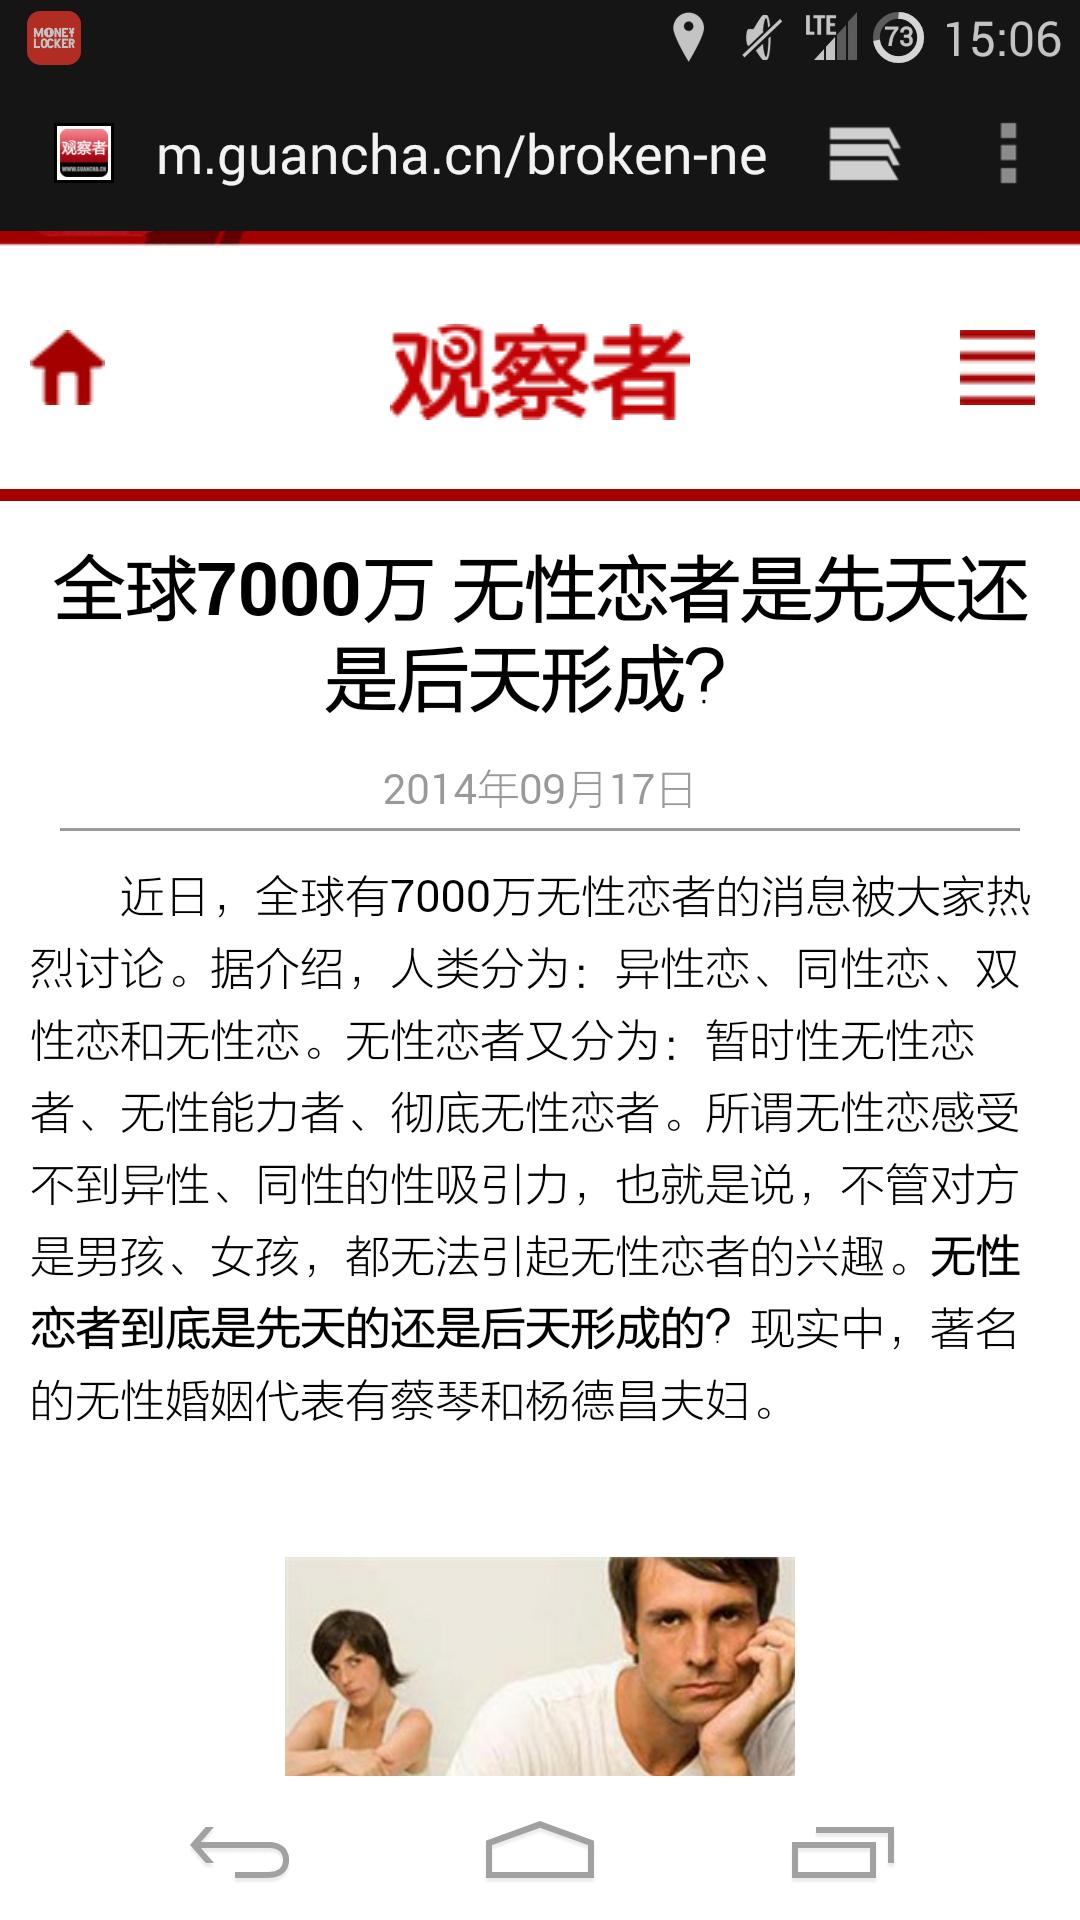 Screenshot_2013-09-17-15-06-50.png